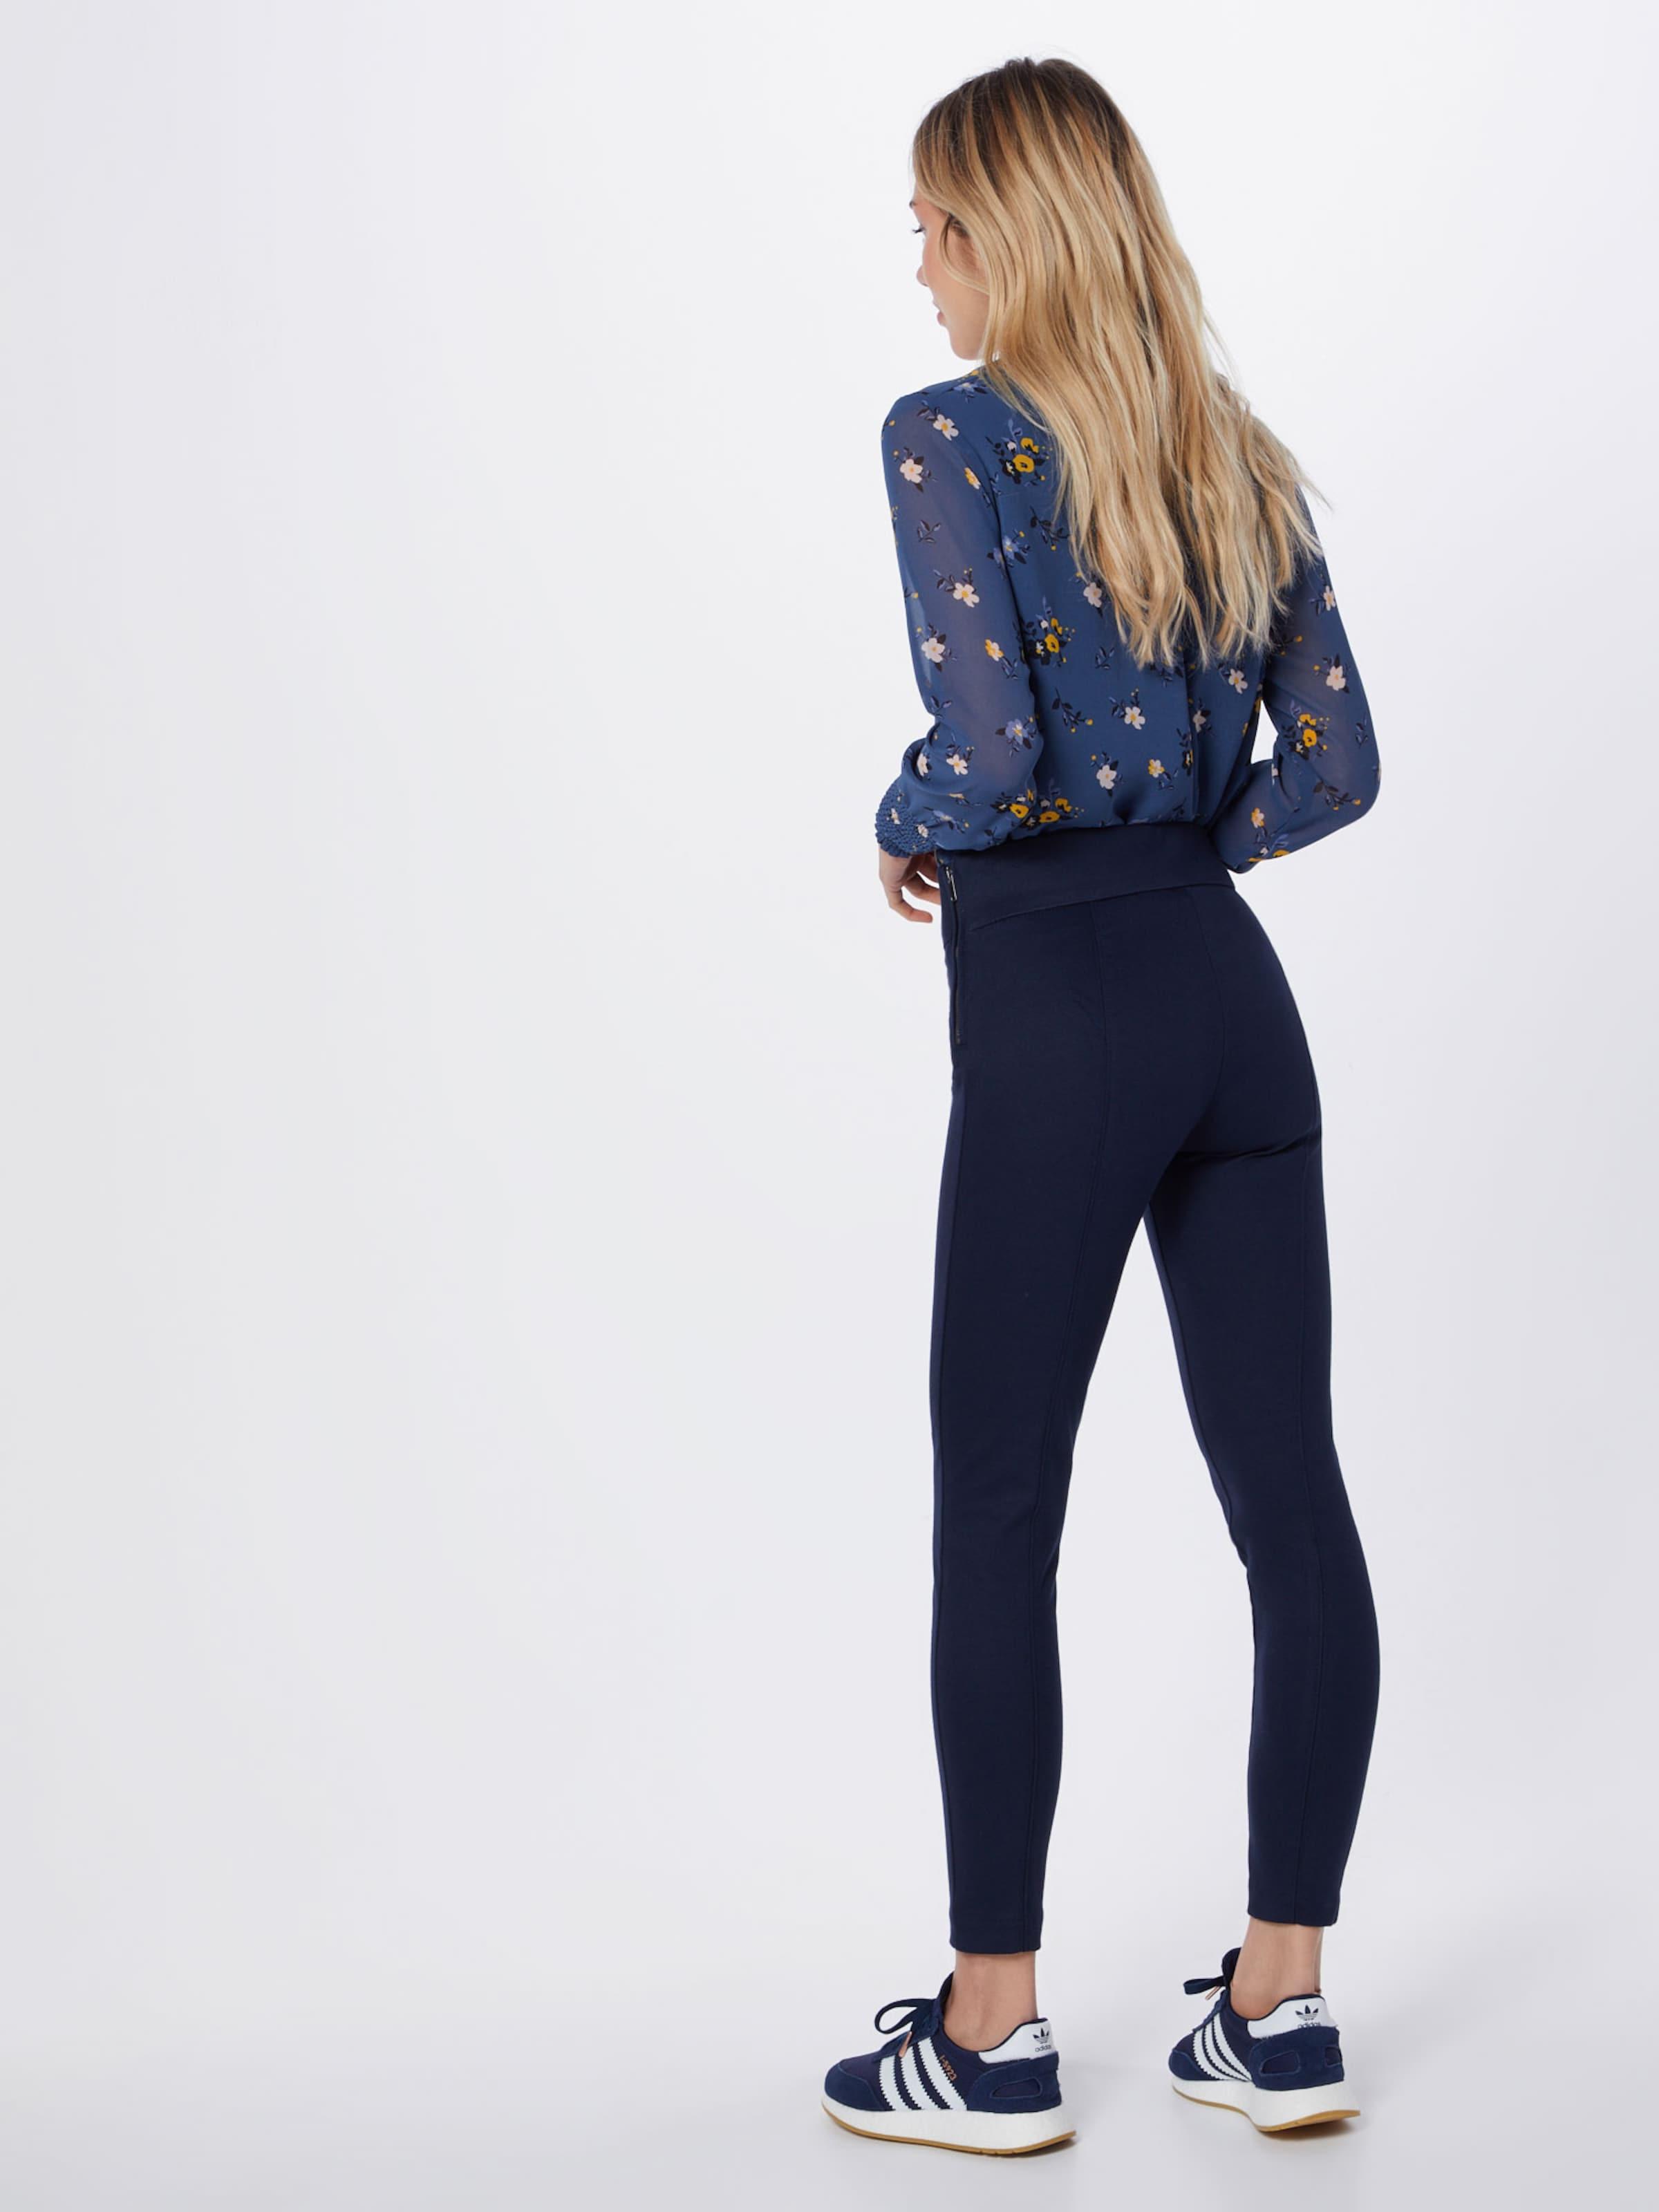 En Zip Pantalon Legging' Bleu Marine 'side Gap YbeWE2IHD9